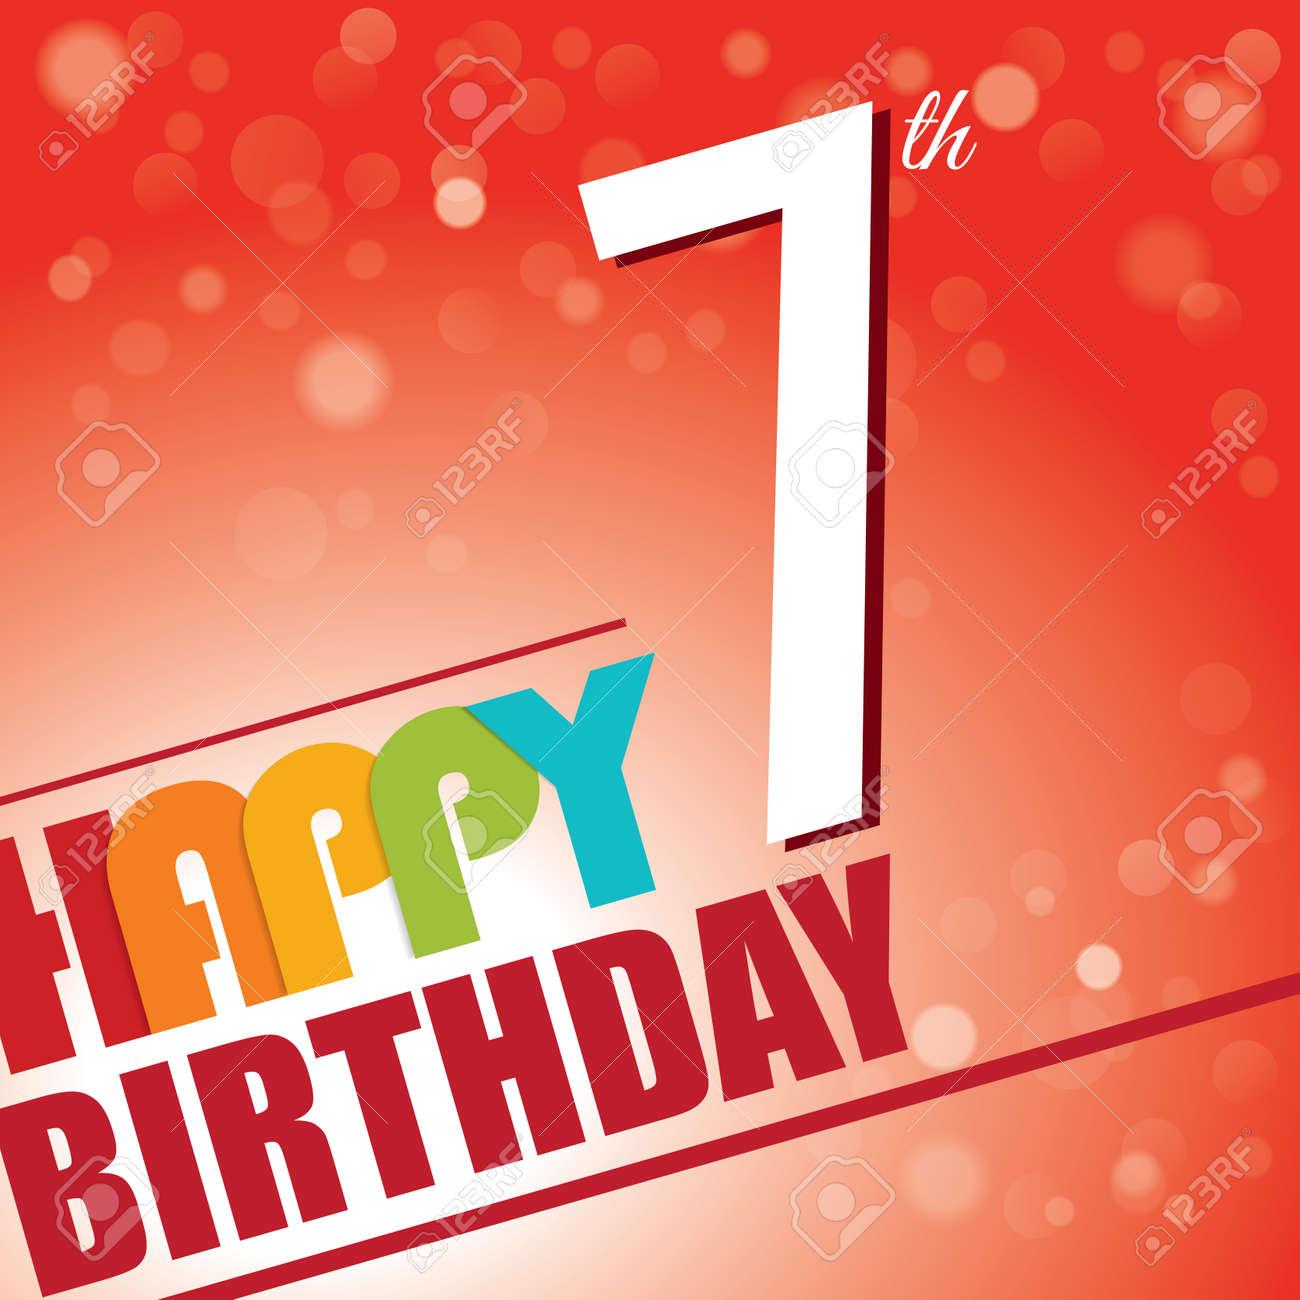 7th birthday party invite template design in bright and colourful